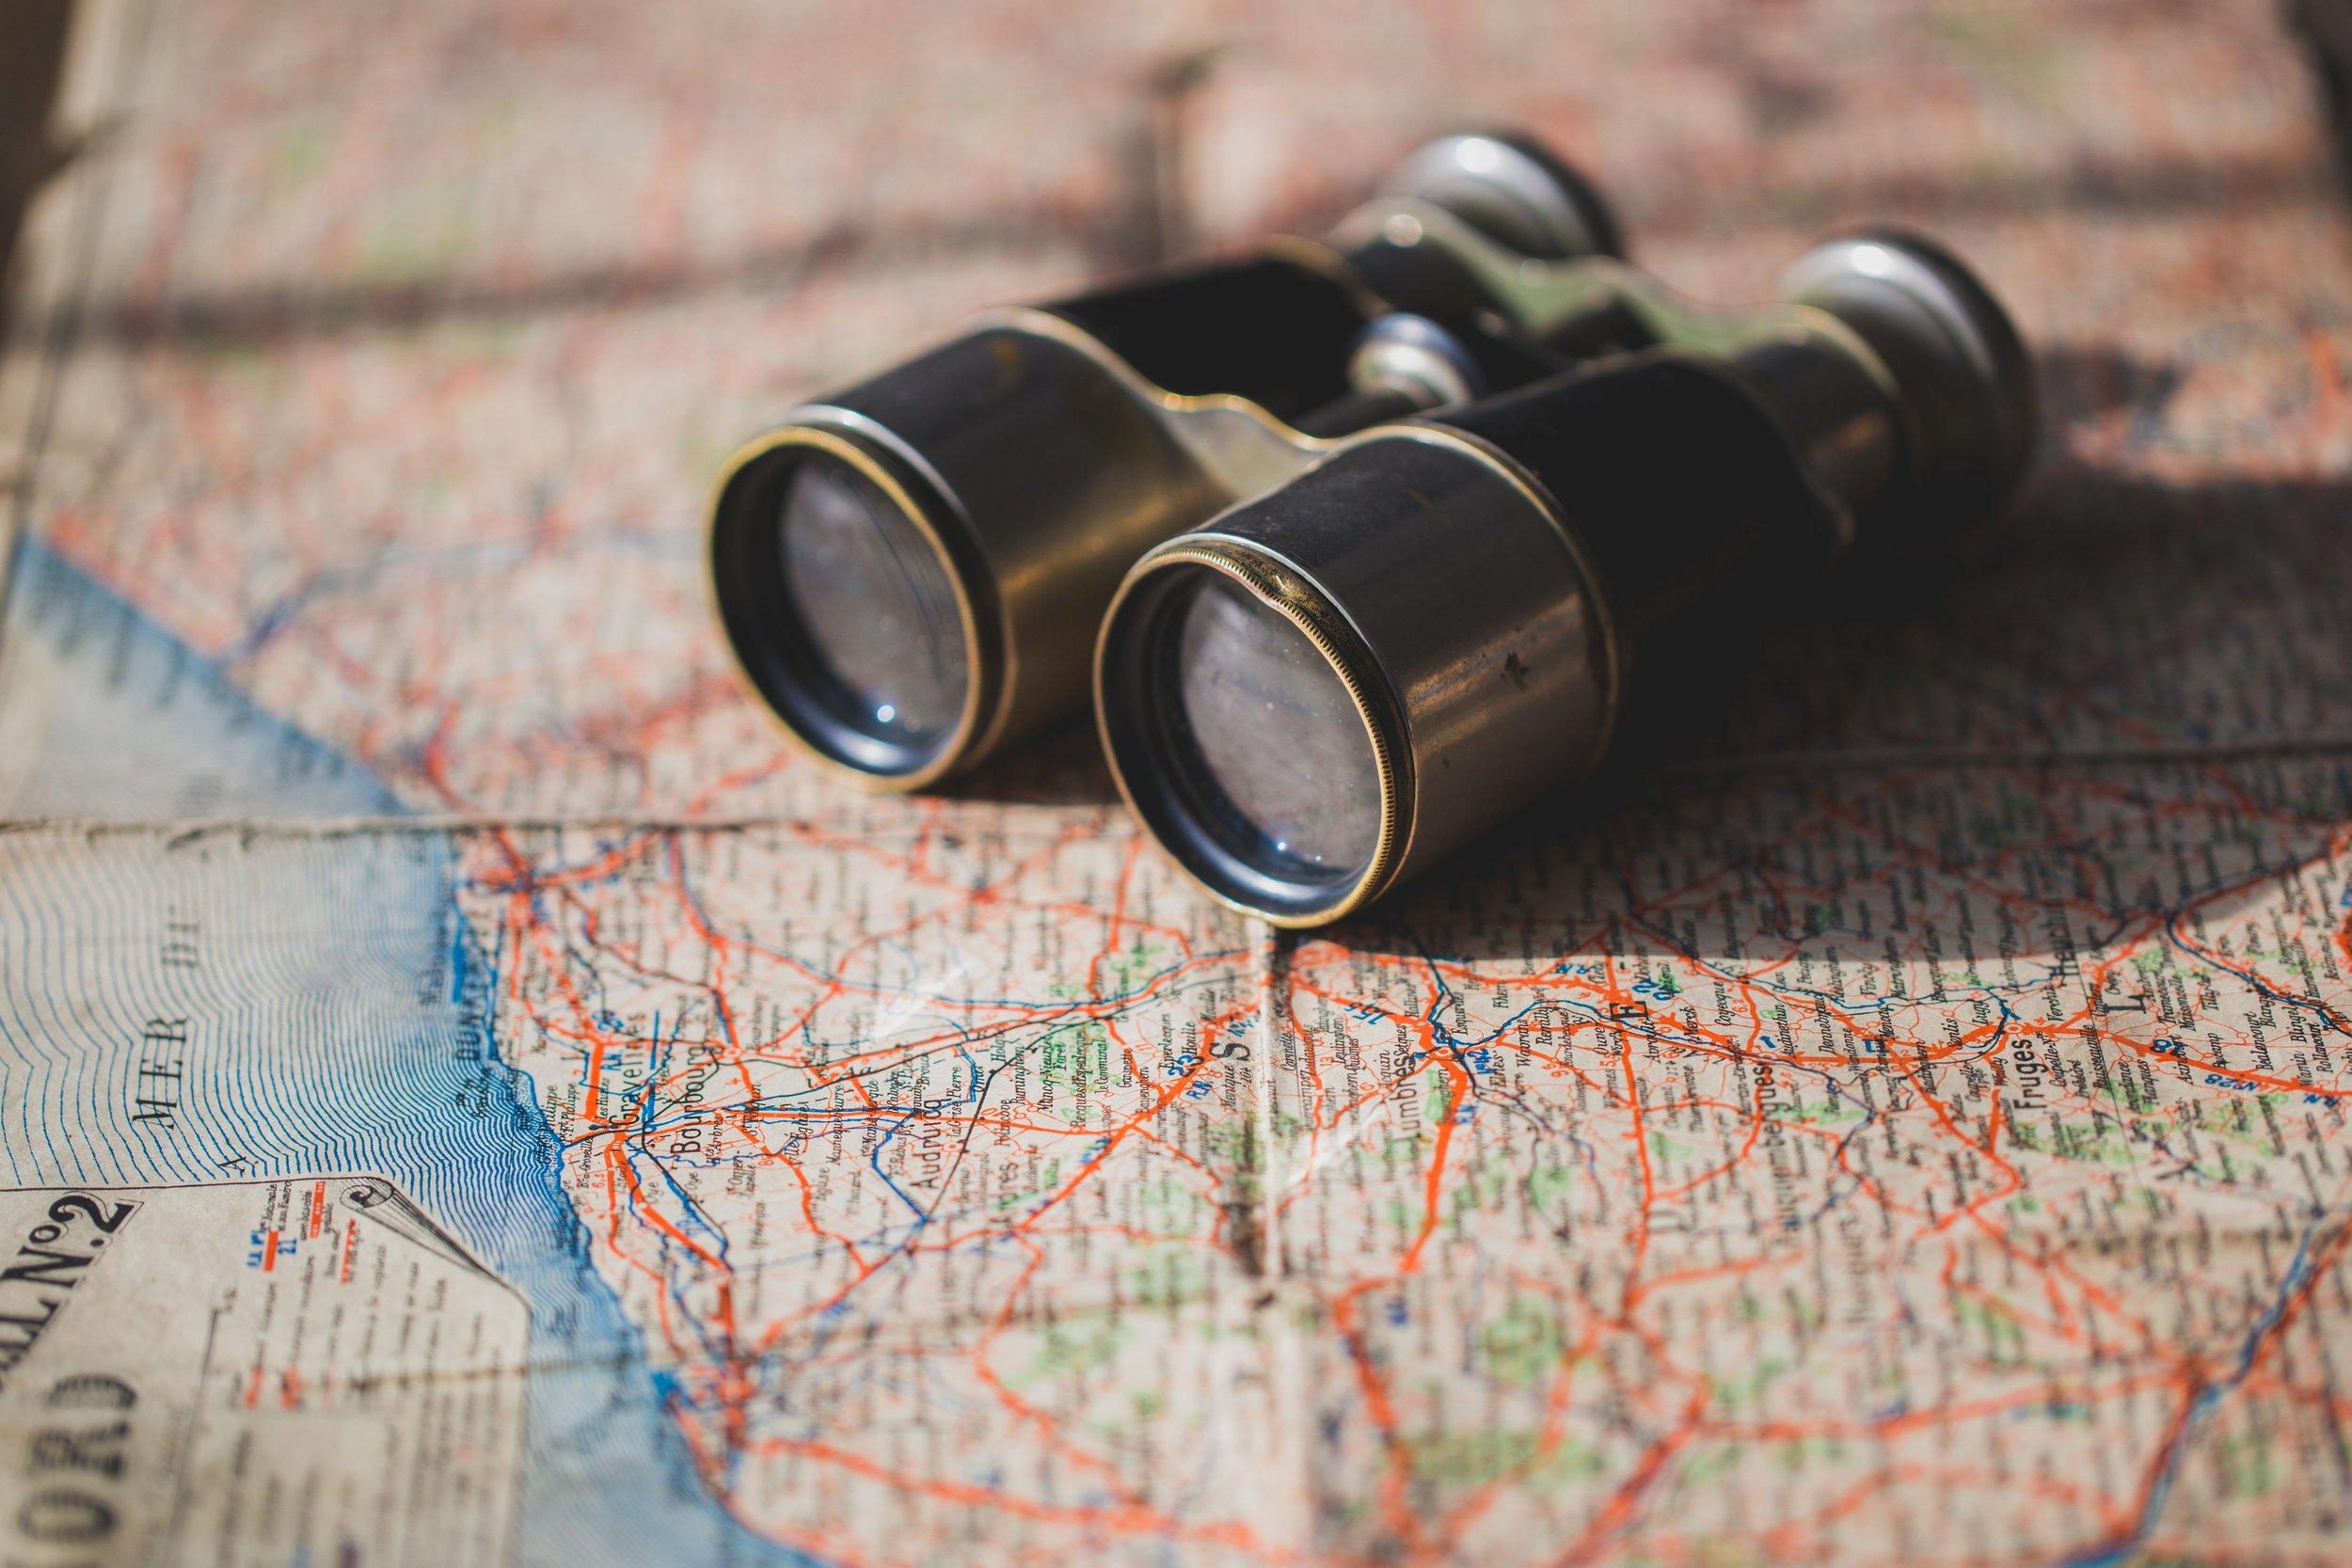 antique-binoculars_4460x4460.jpg